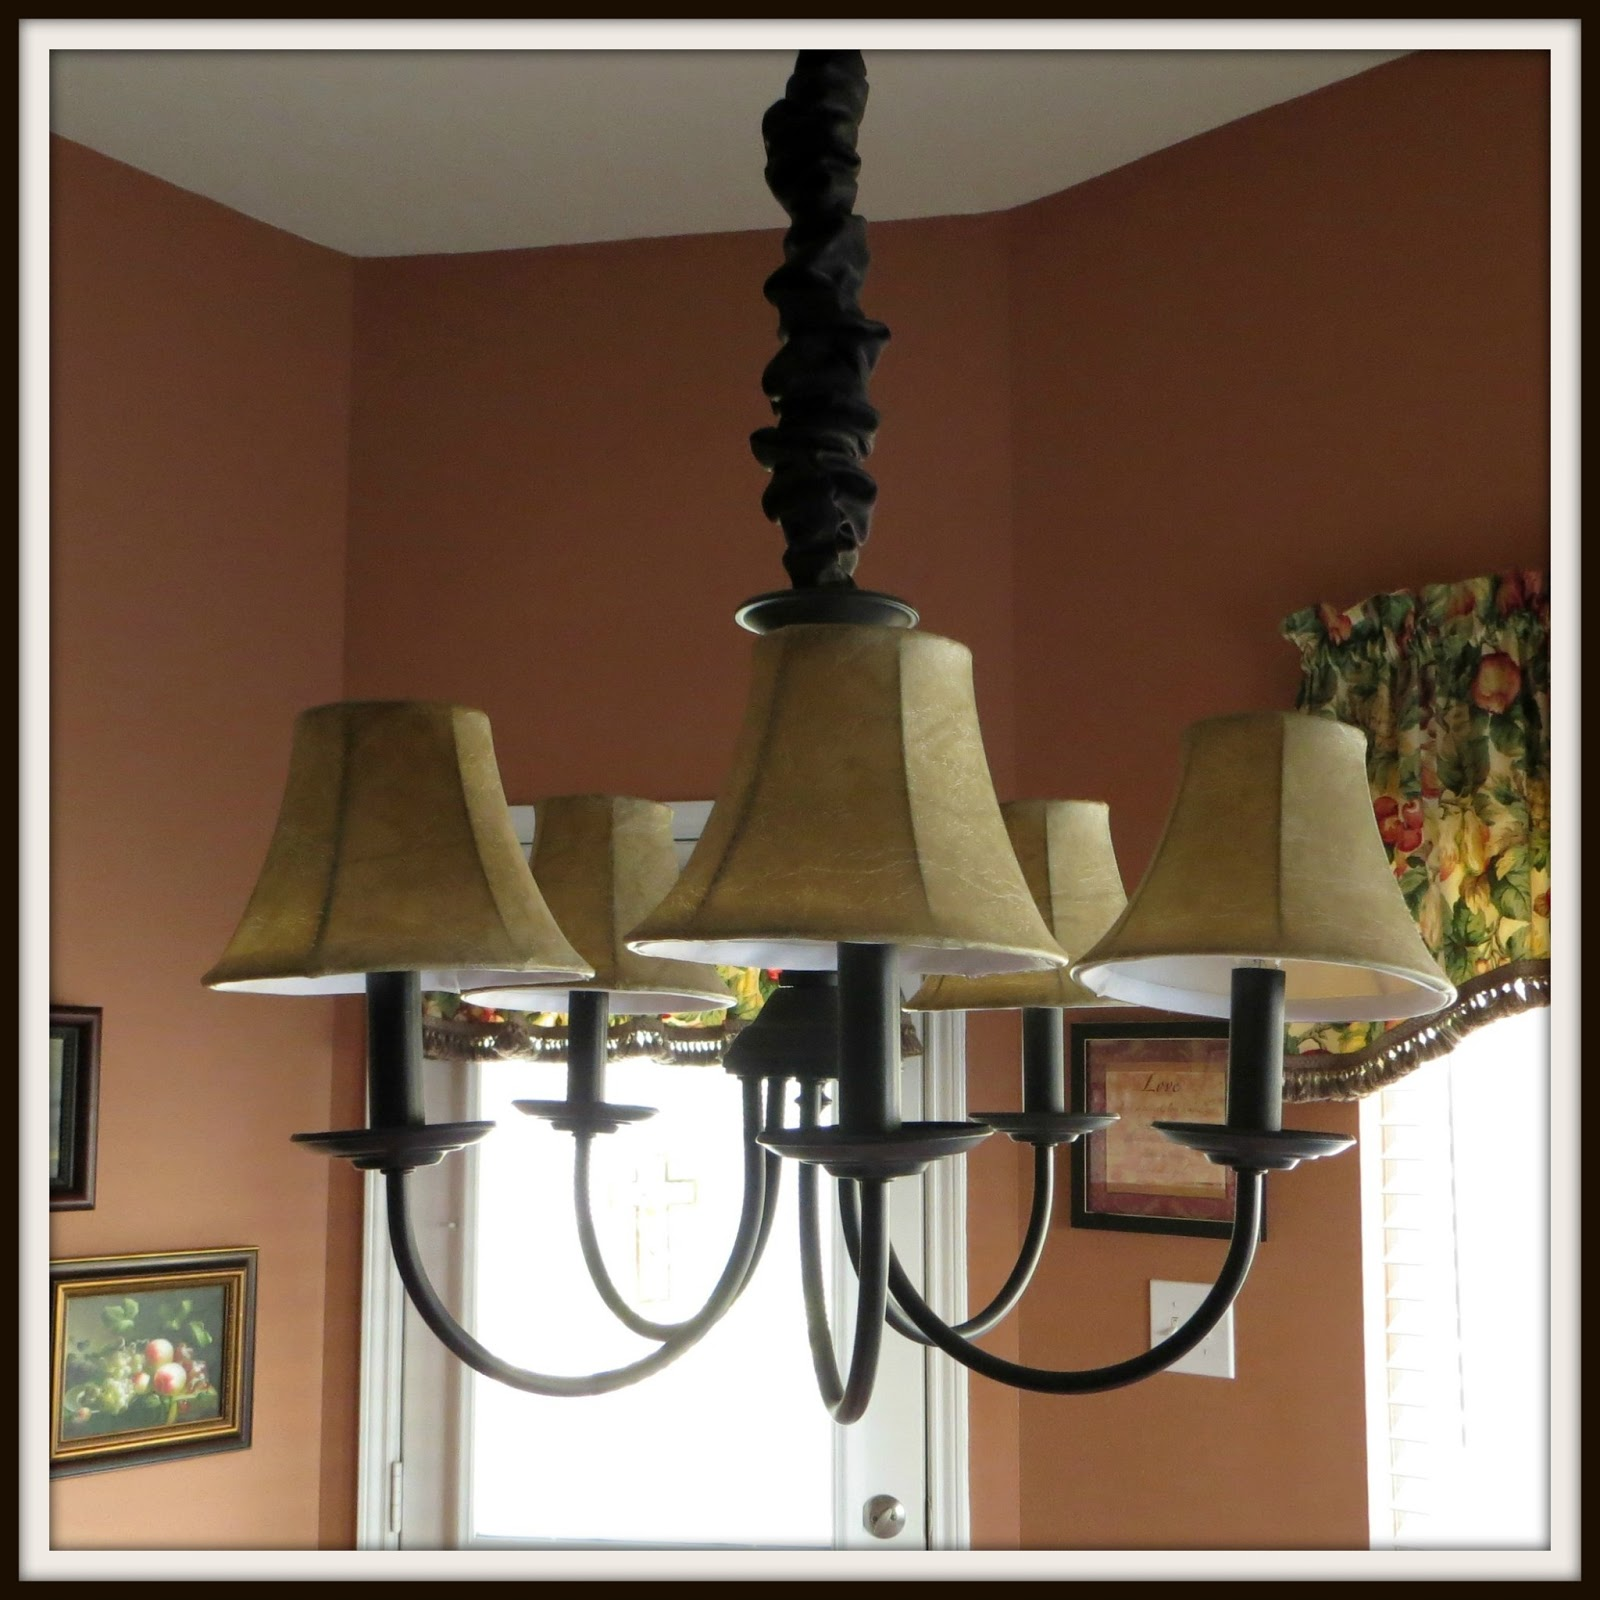 Dining Room Light Fixture: Crafty In Crosby: Breakfast Room Light Fixture